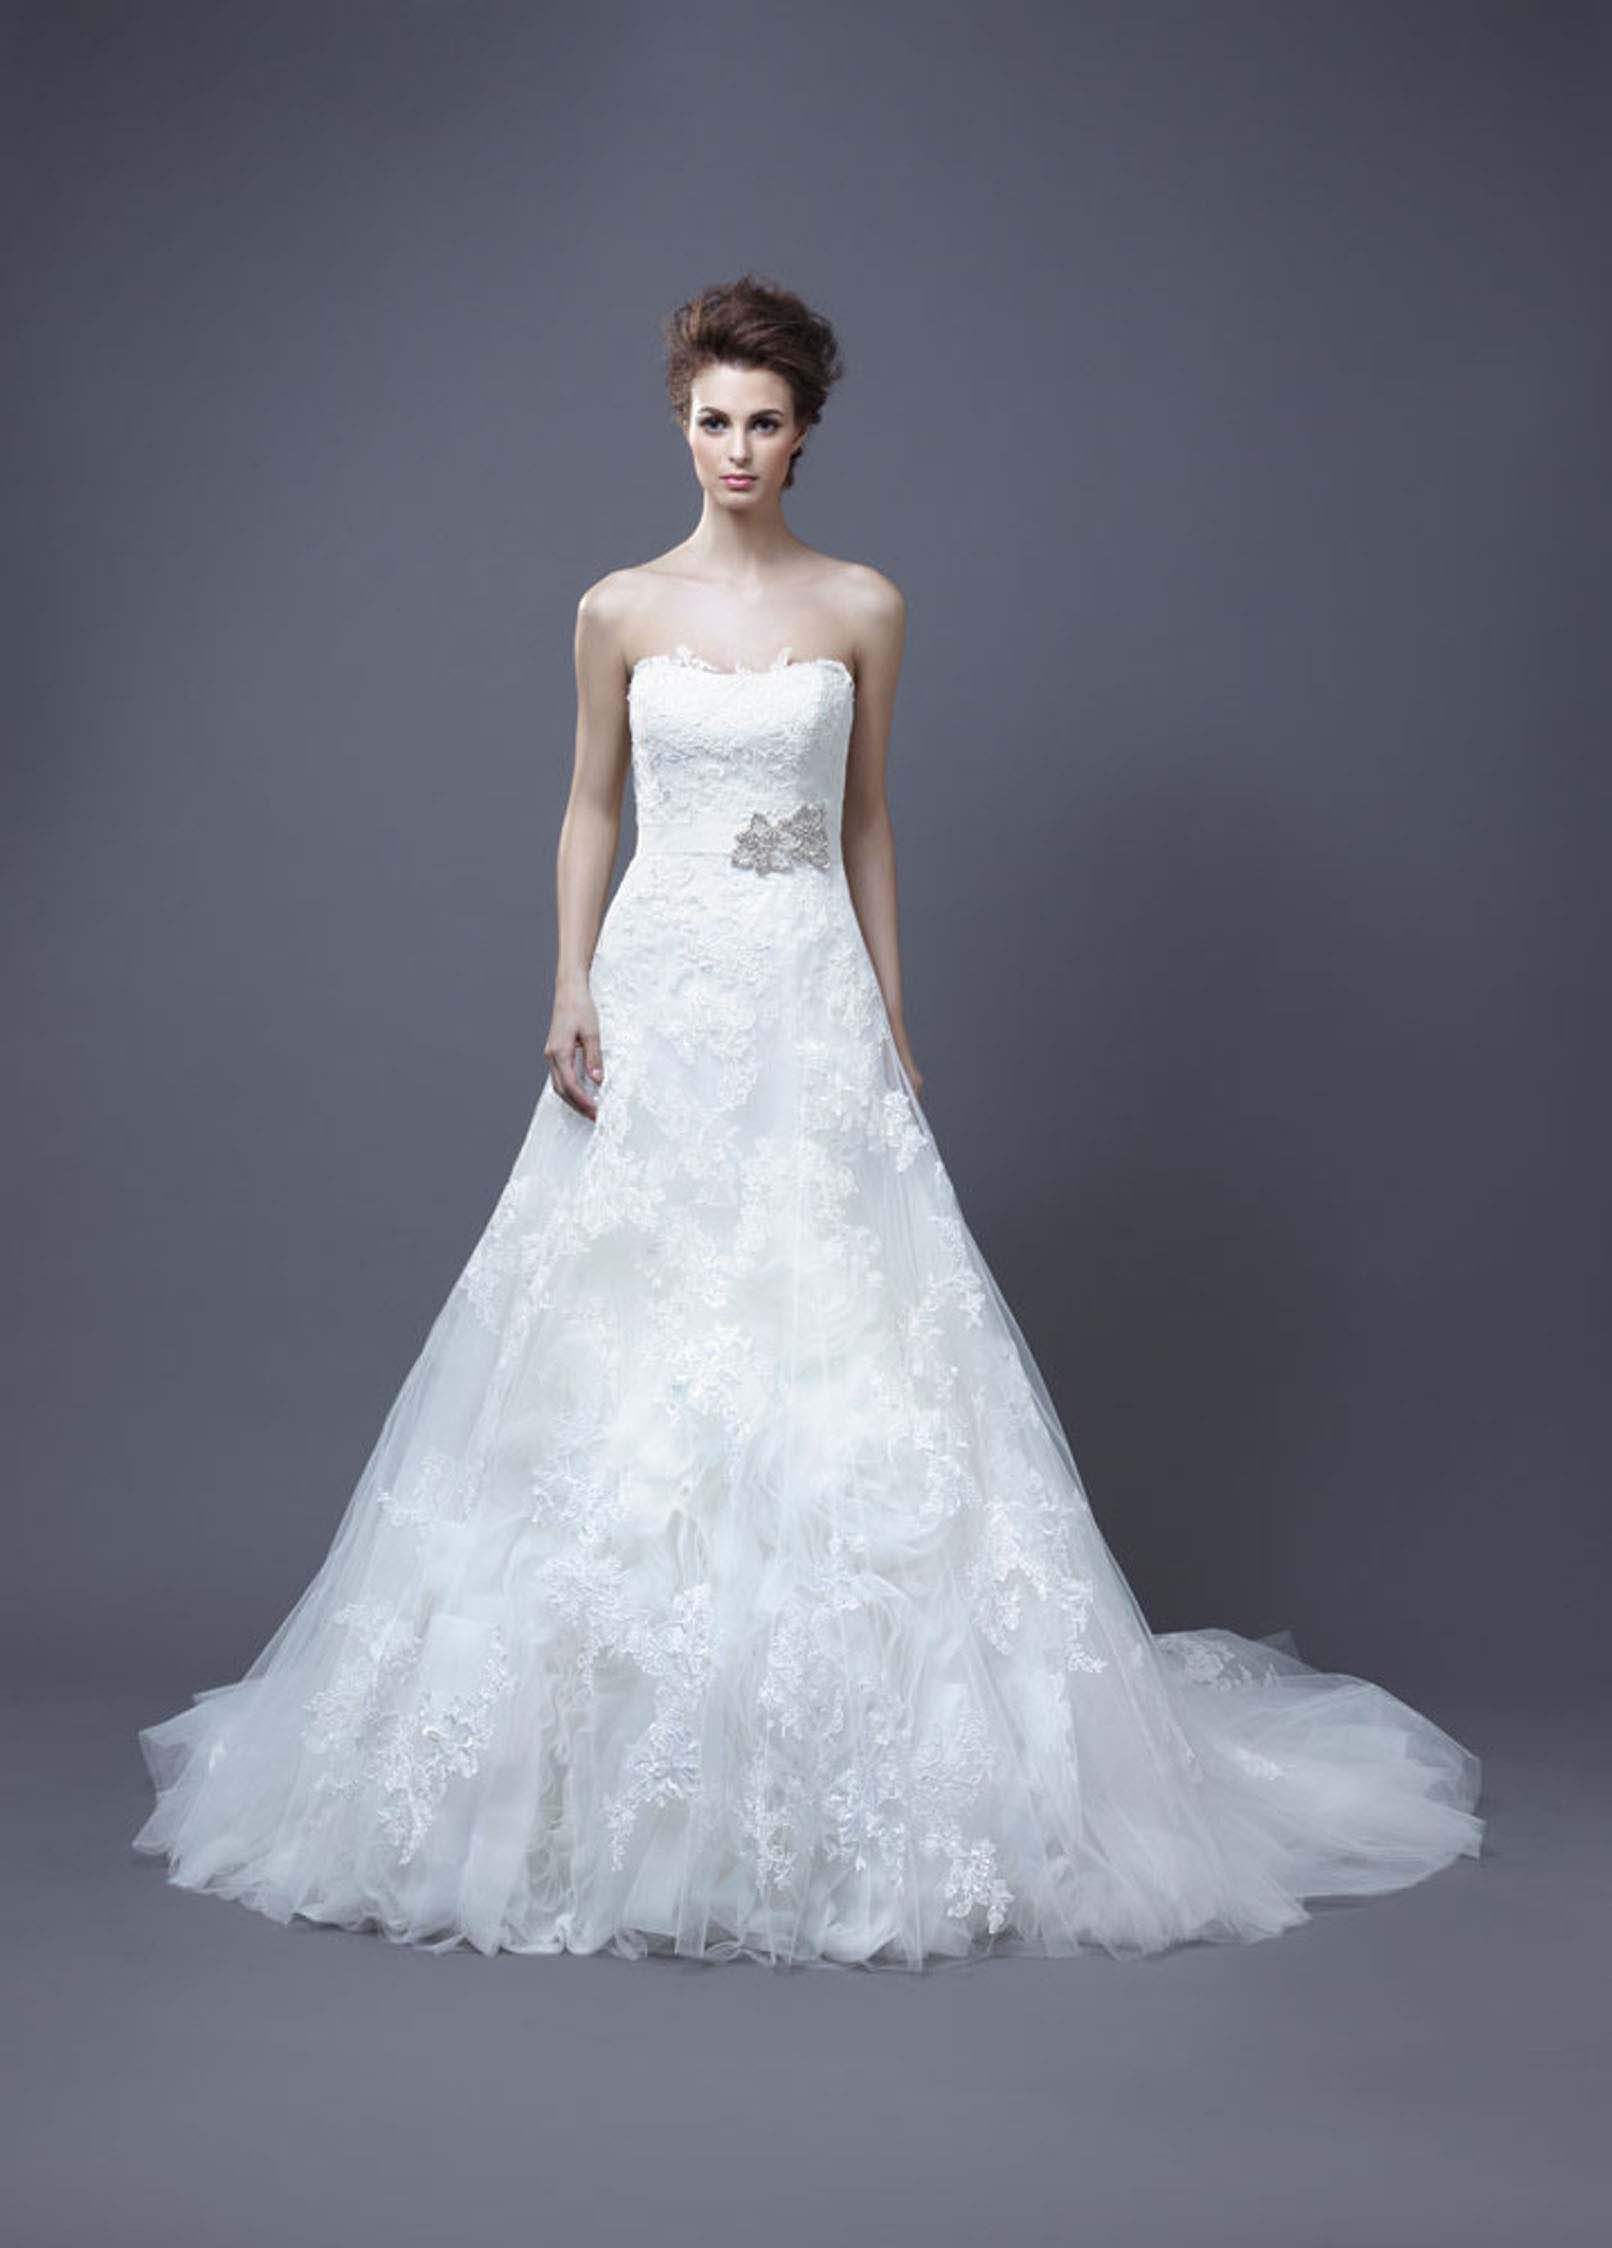 modeca wedding dress by enzoani | Enzoani,Wedding dresses-Online ...